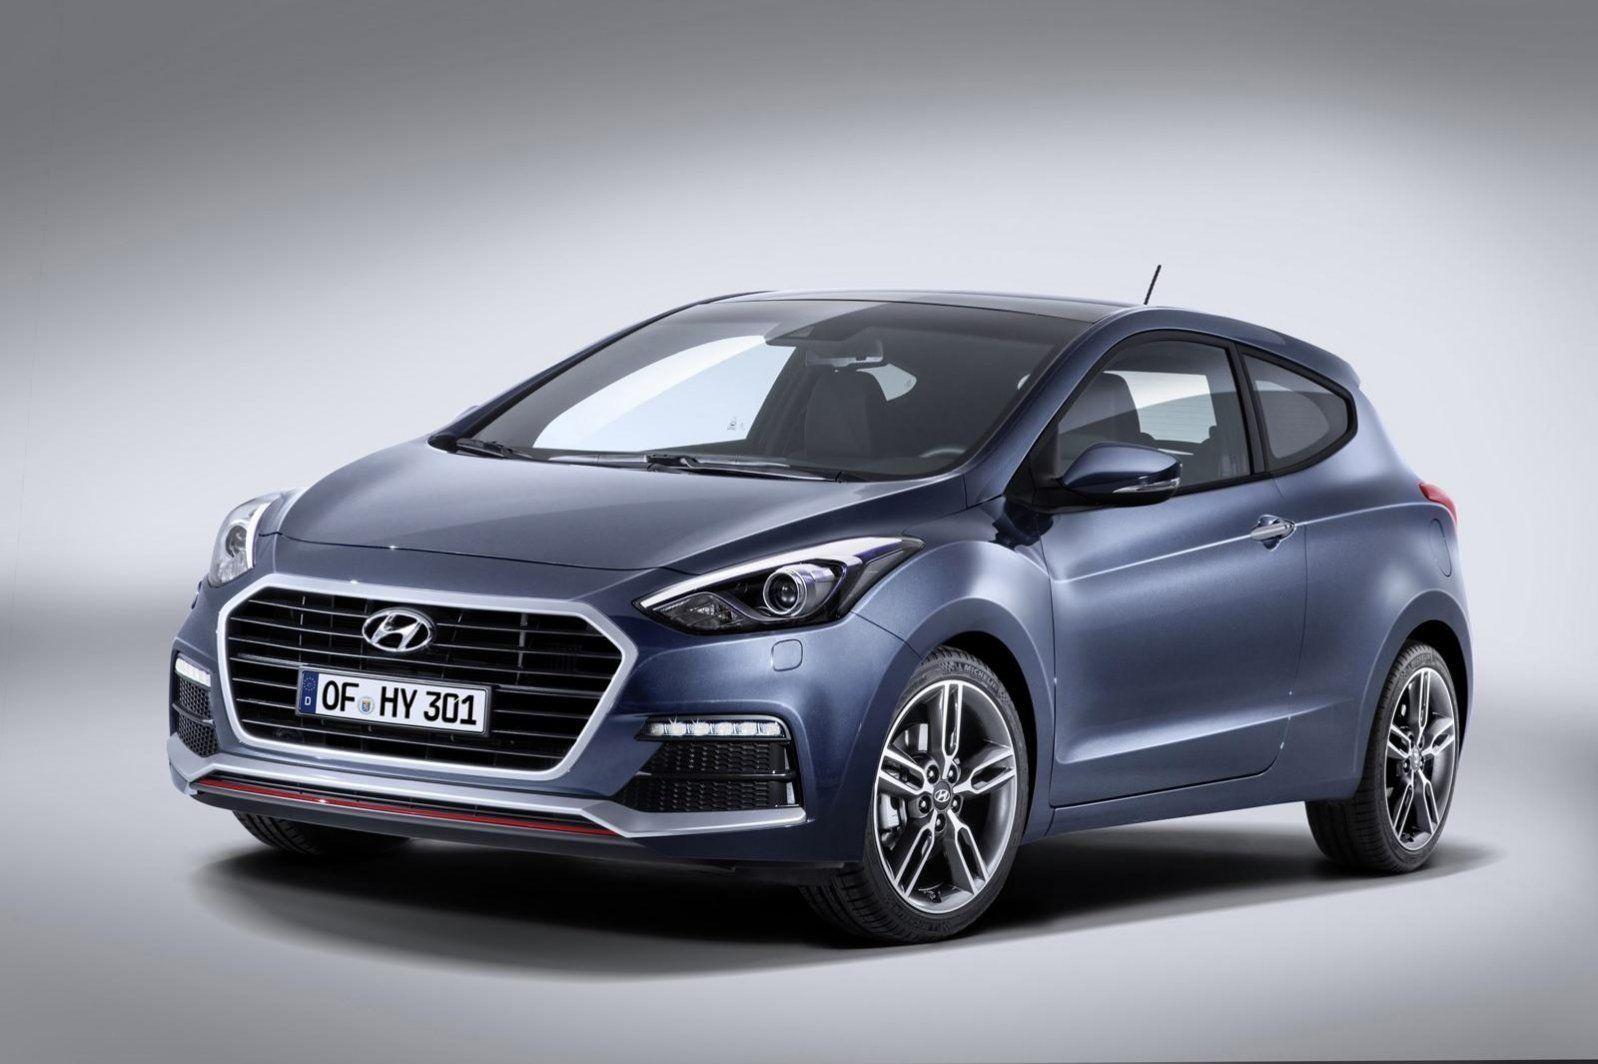 The Hyundai I30 2020 New Release Cars Review 2019 Hyundai Cars